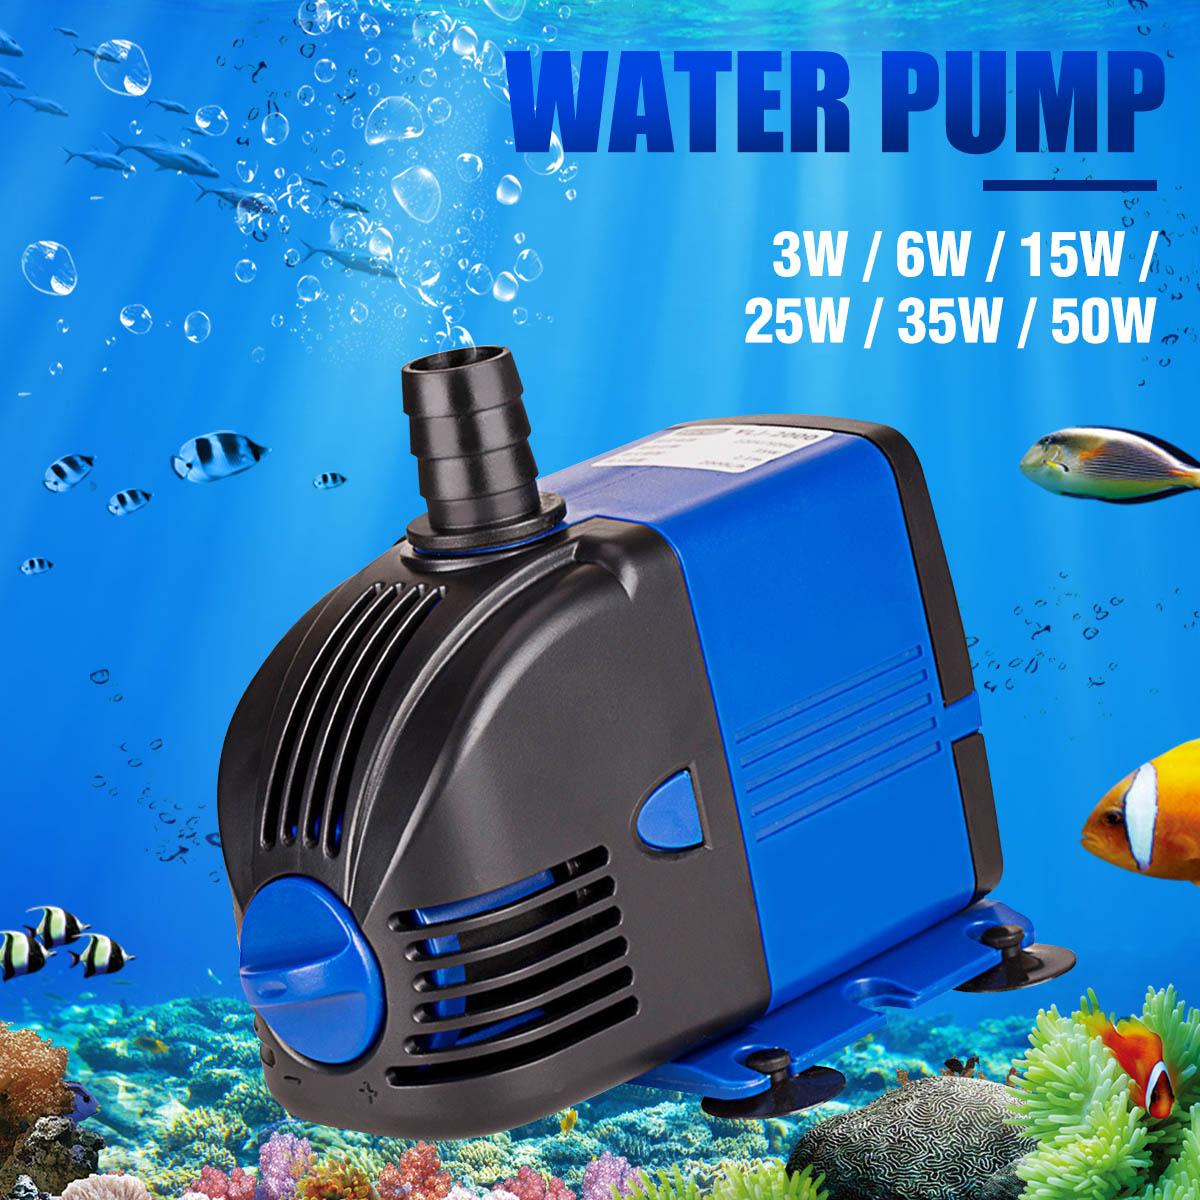 New Ultra-Quiet Submersible Water Fountain Pump Filter Fish Pond Aquarium Water Pump Fish Tank Power Head 15/25/35/50W